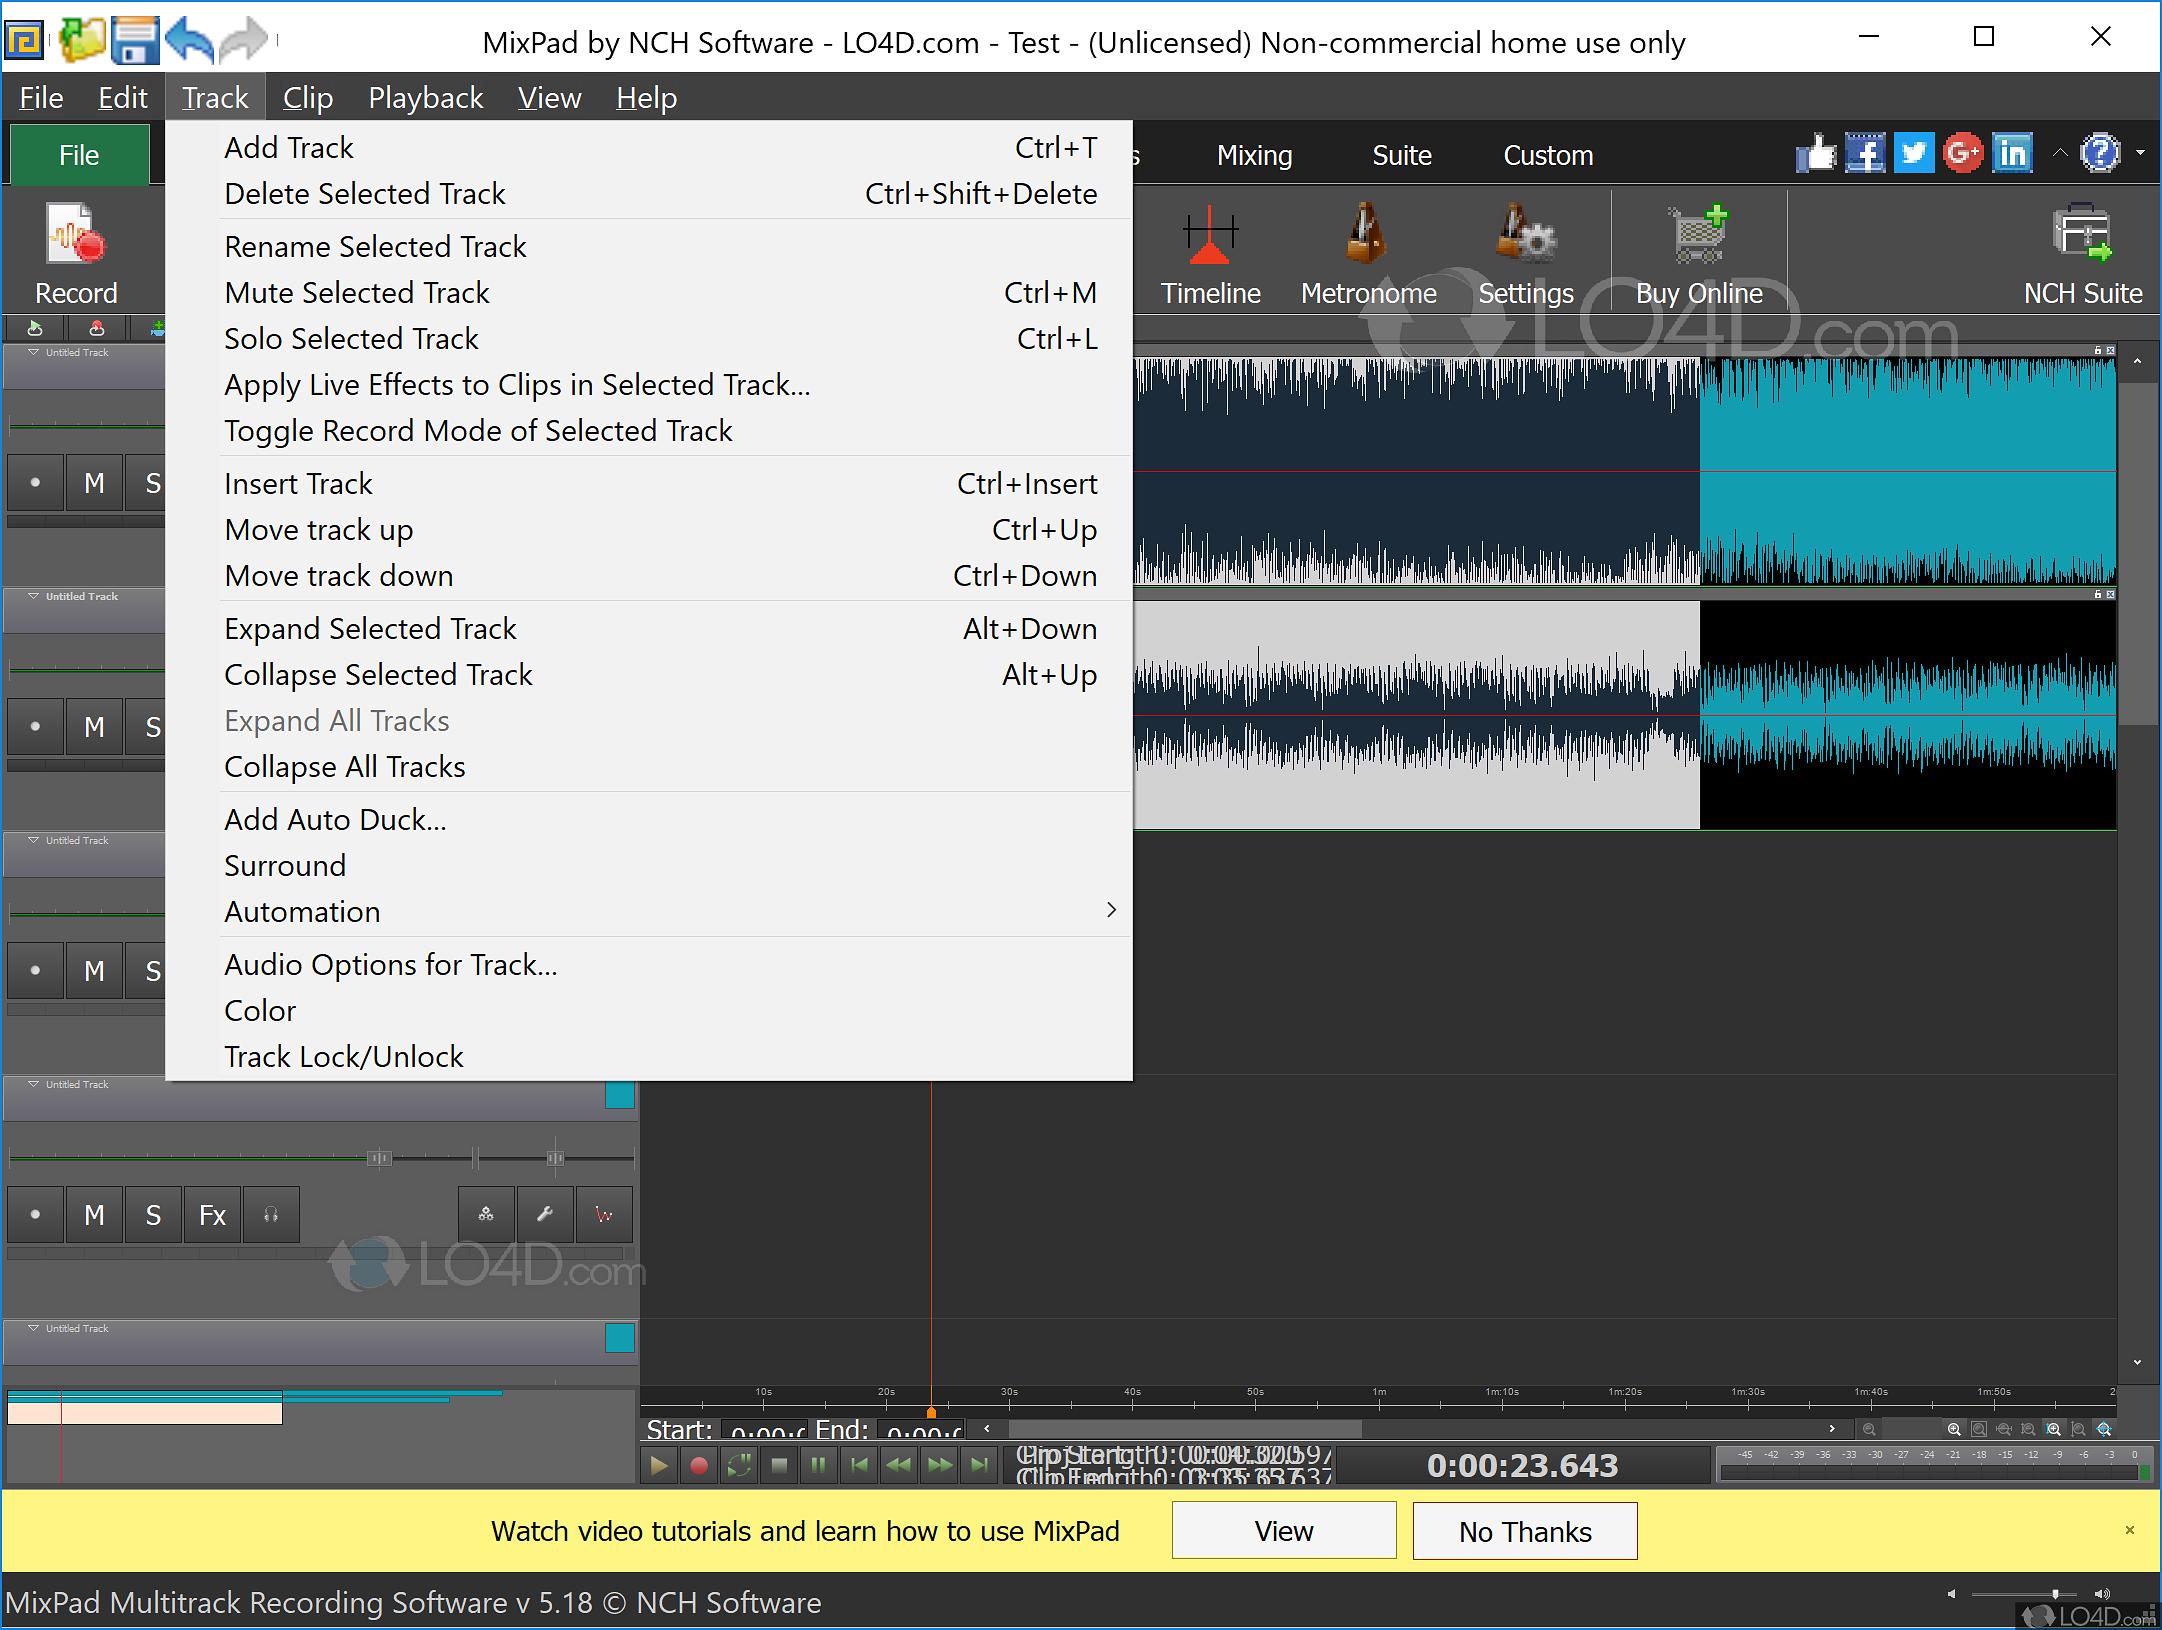 mixpad full version free